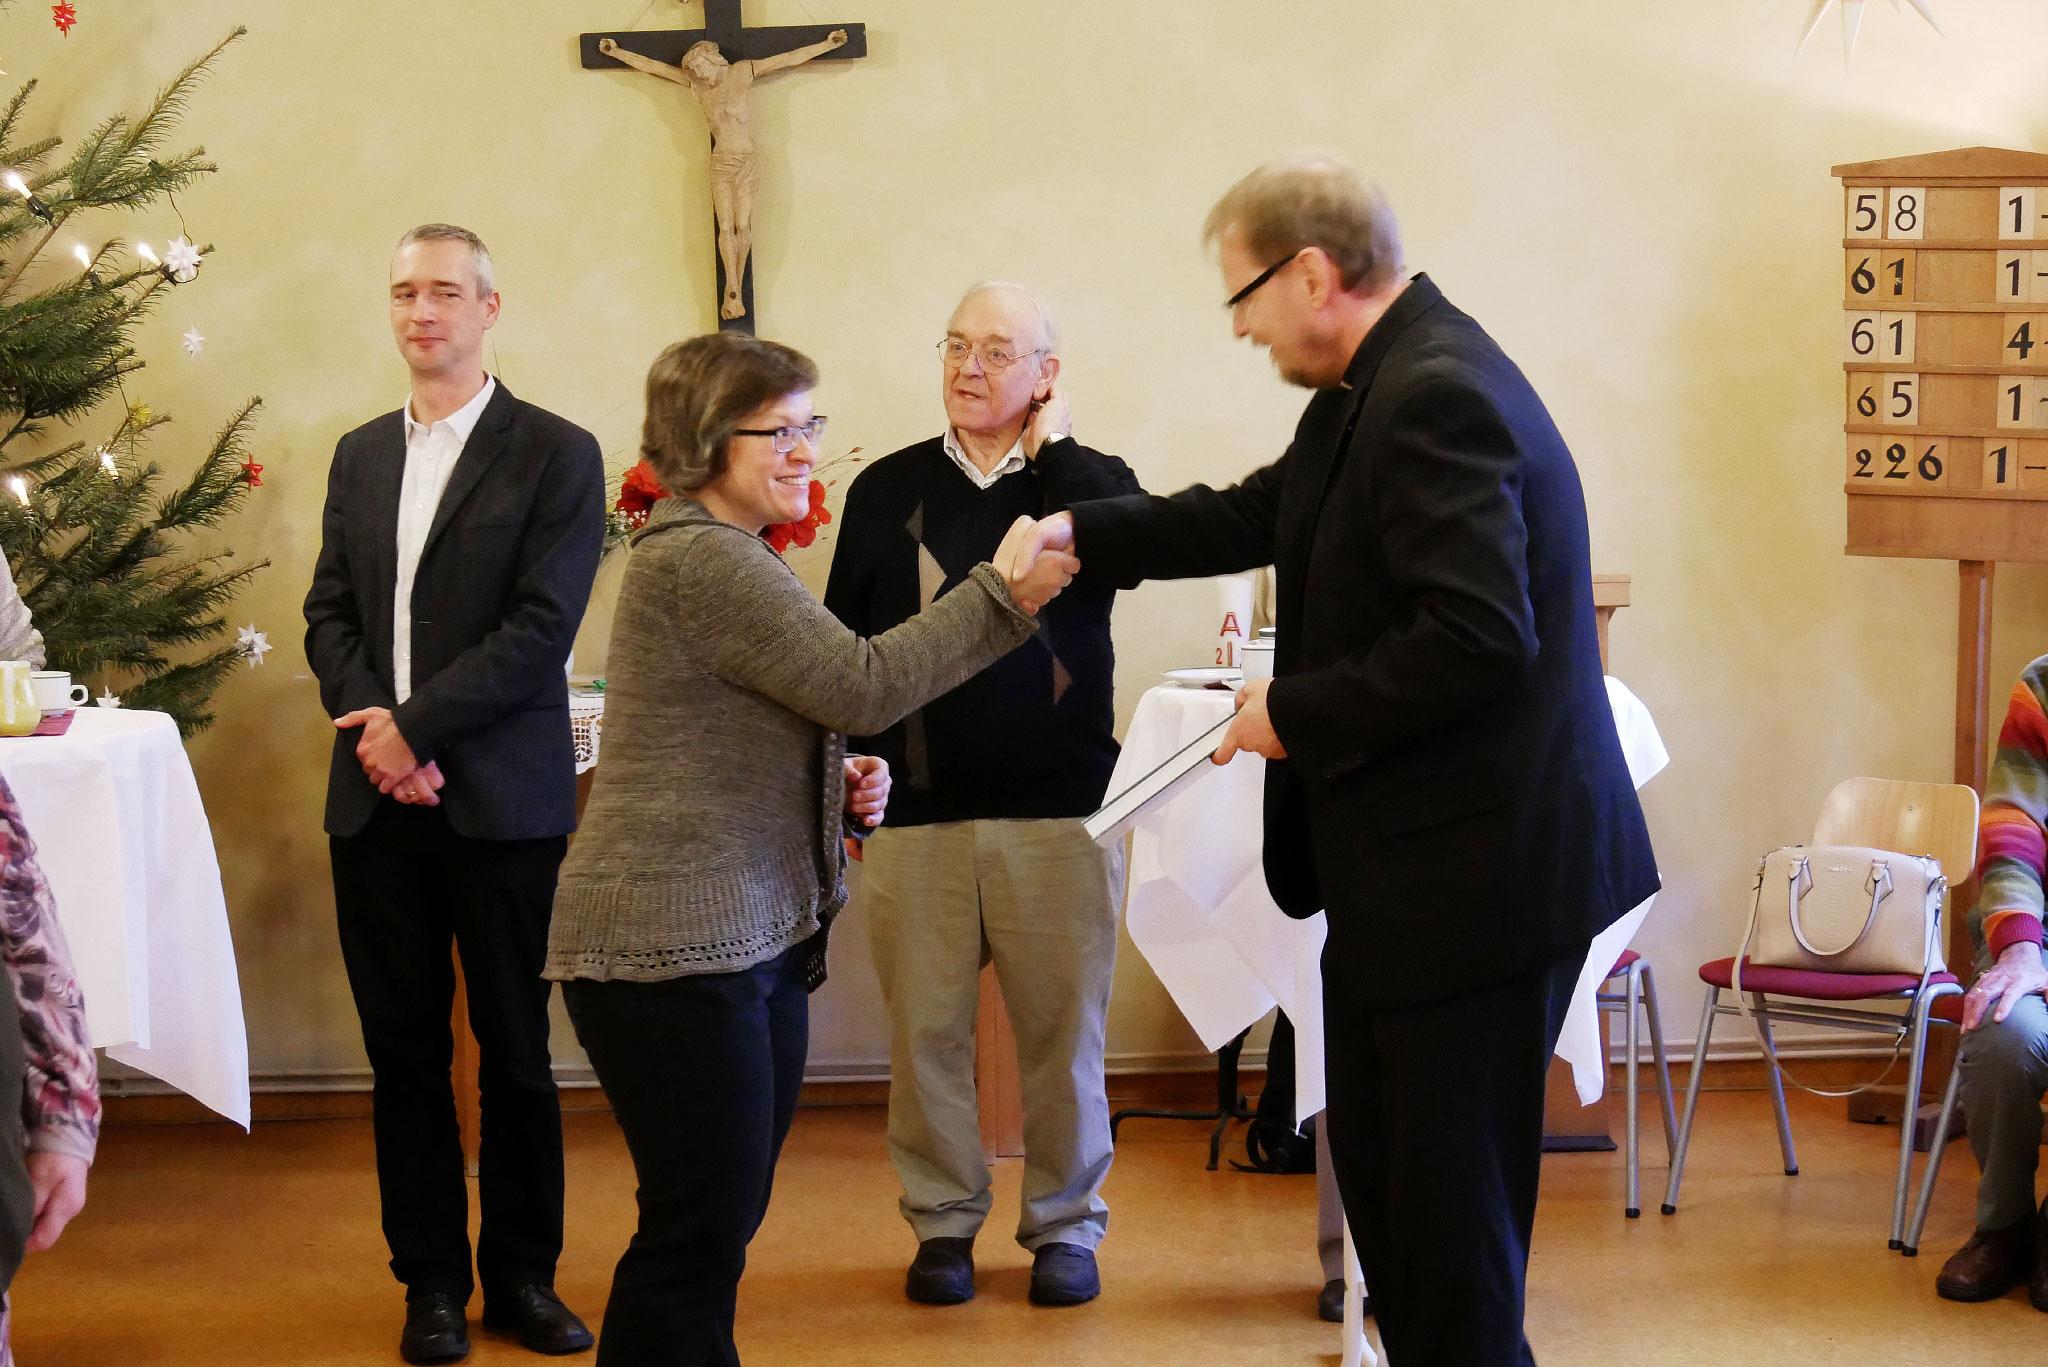 Pfarrerin Christiane Moldenhauer und Priester Burkhard Stegemann